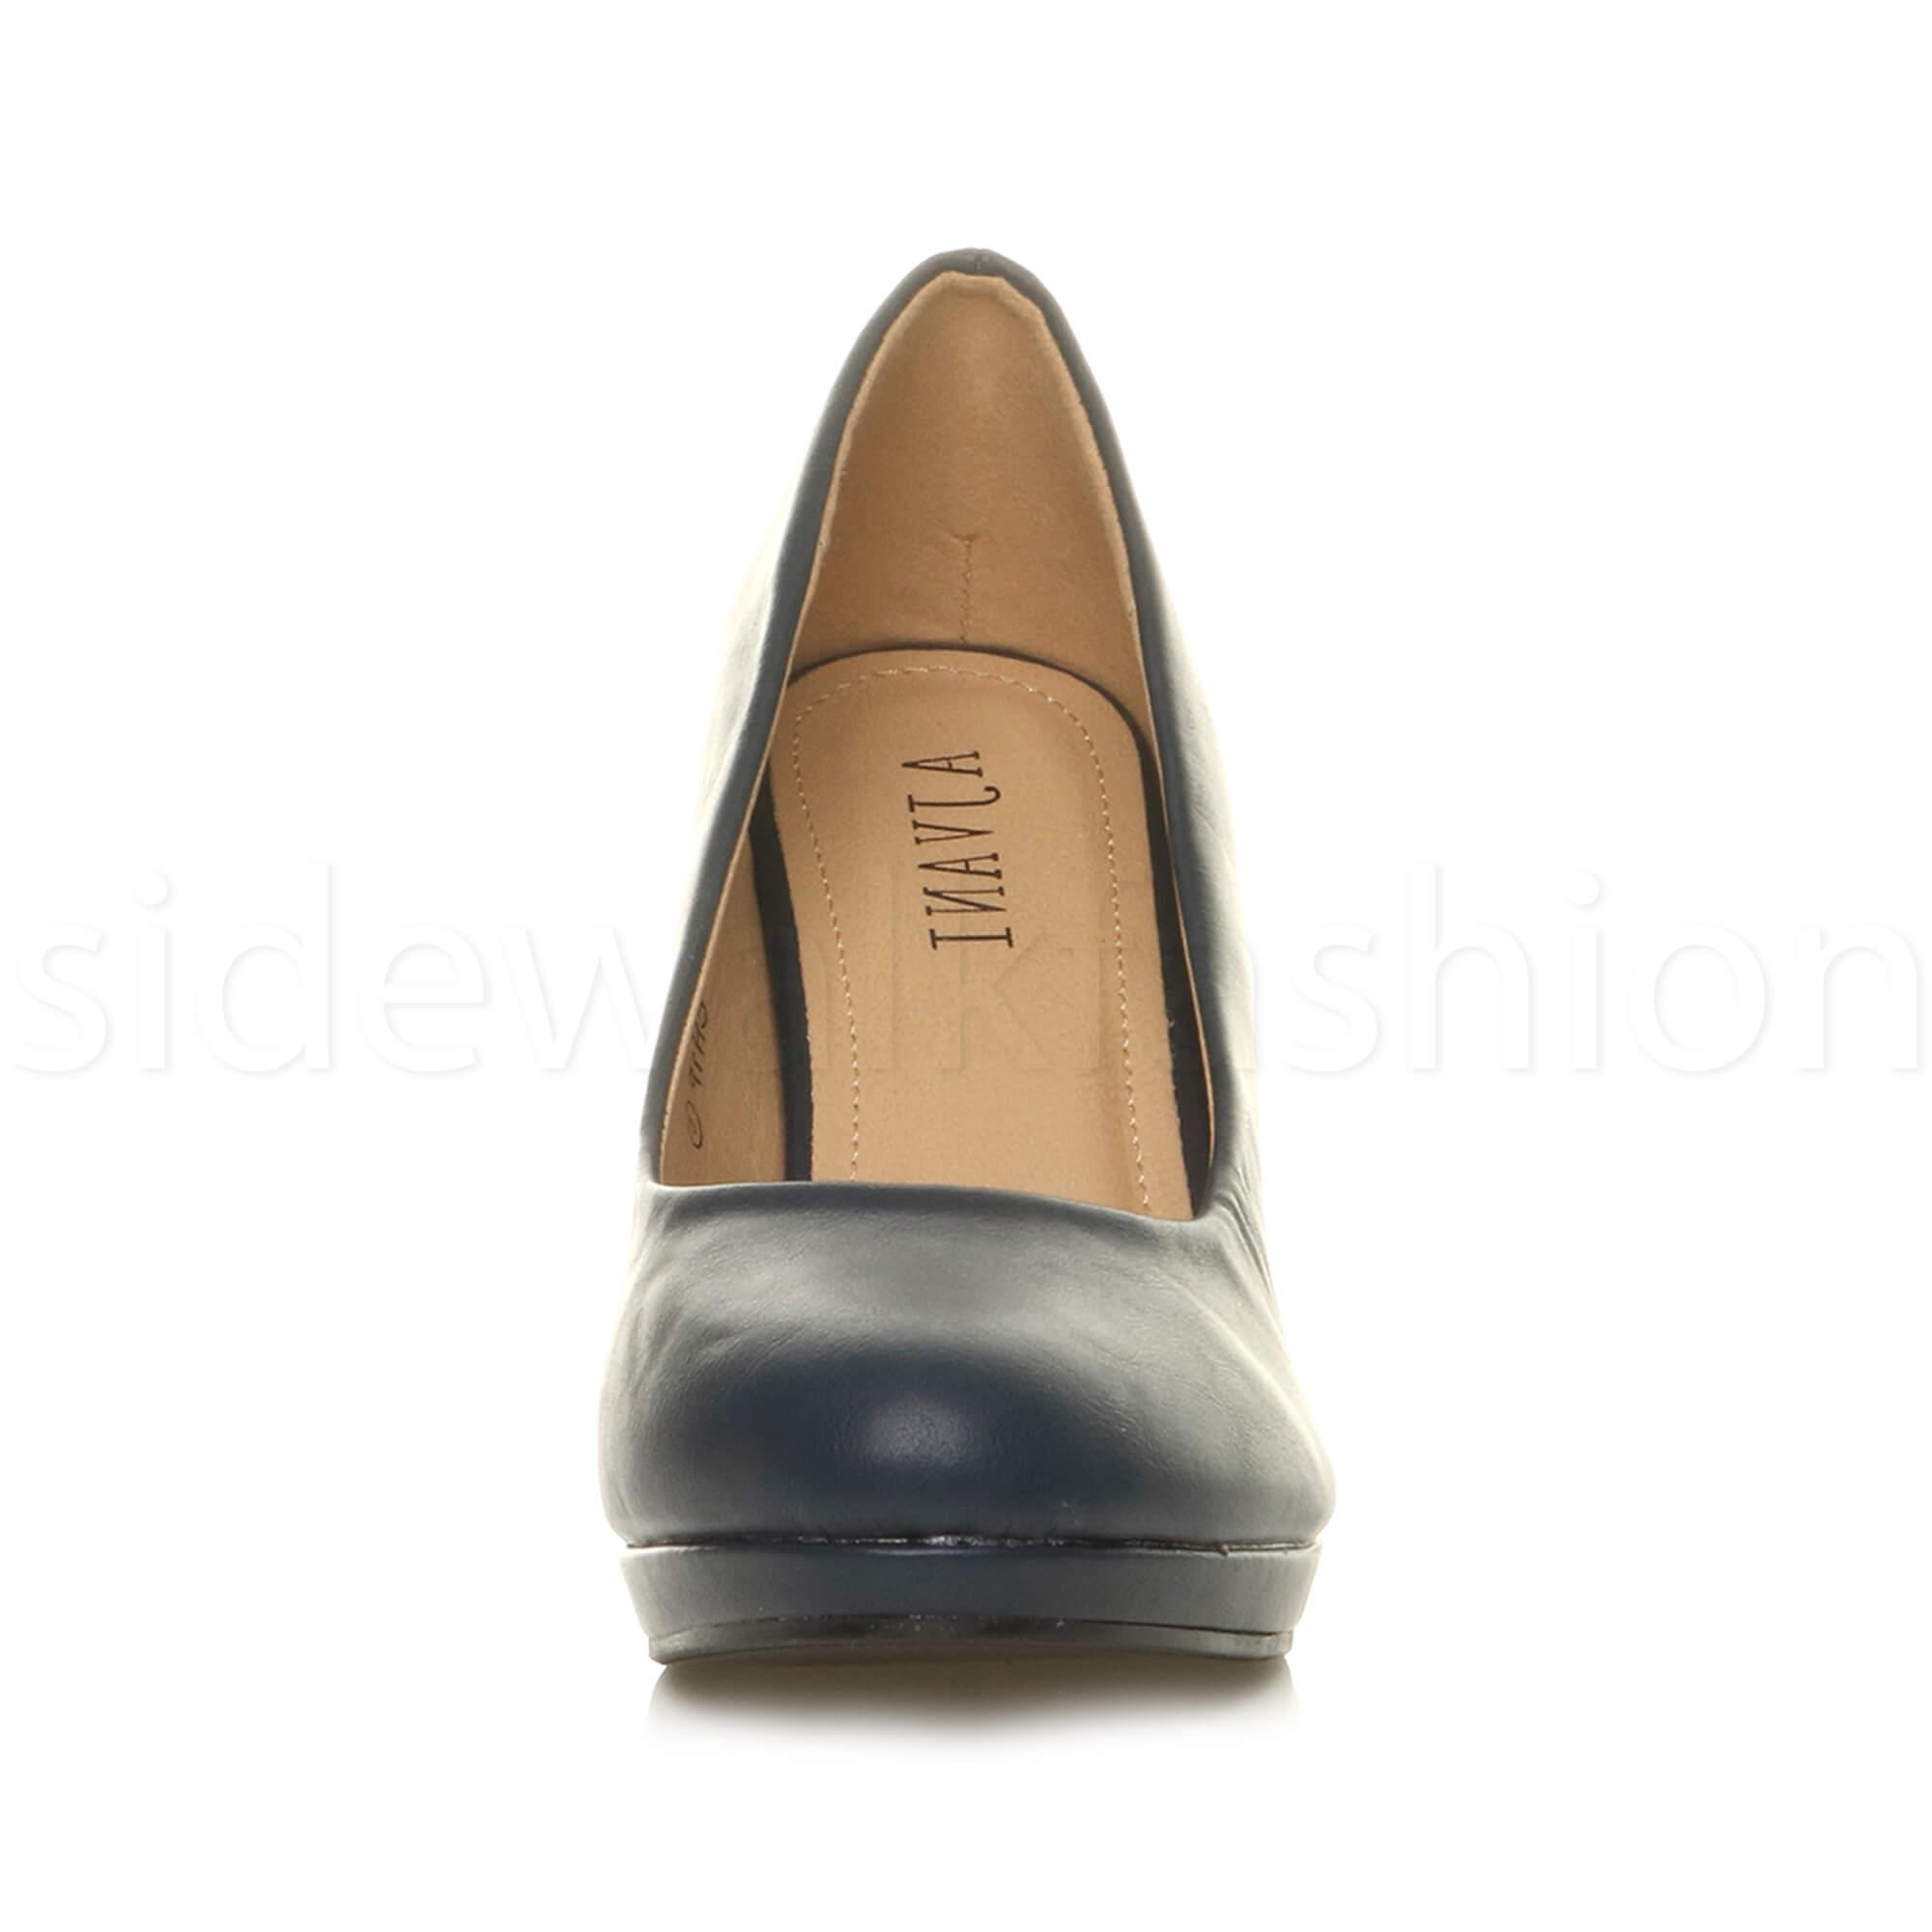 Womens-ladies-high-mid-heel-platform-wedding-evening-bridesmaid-court-shoes-size thumbnail 104